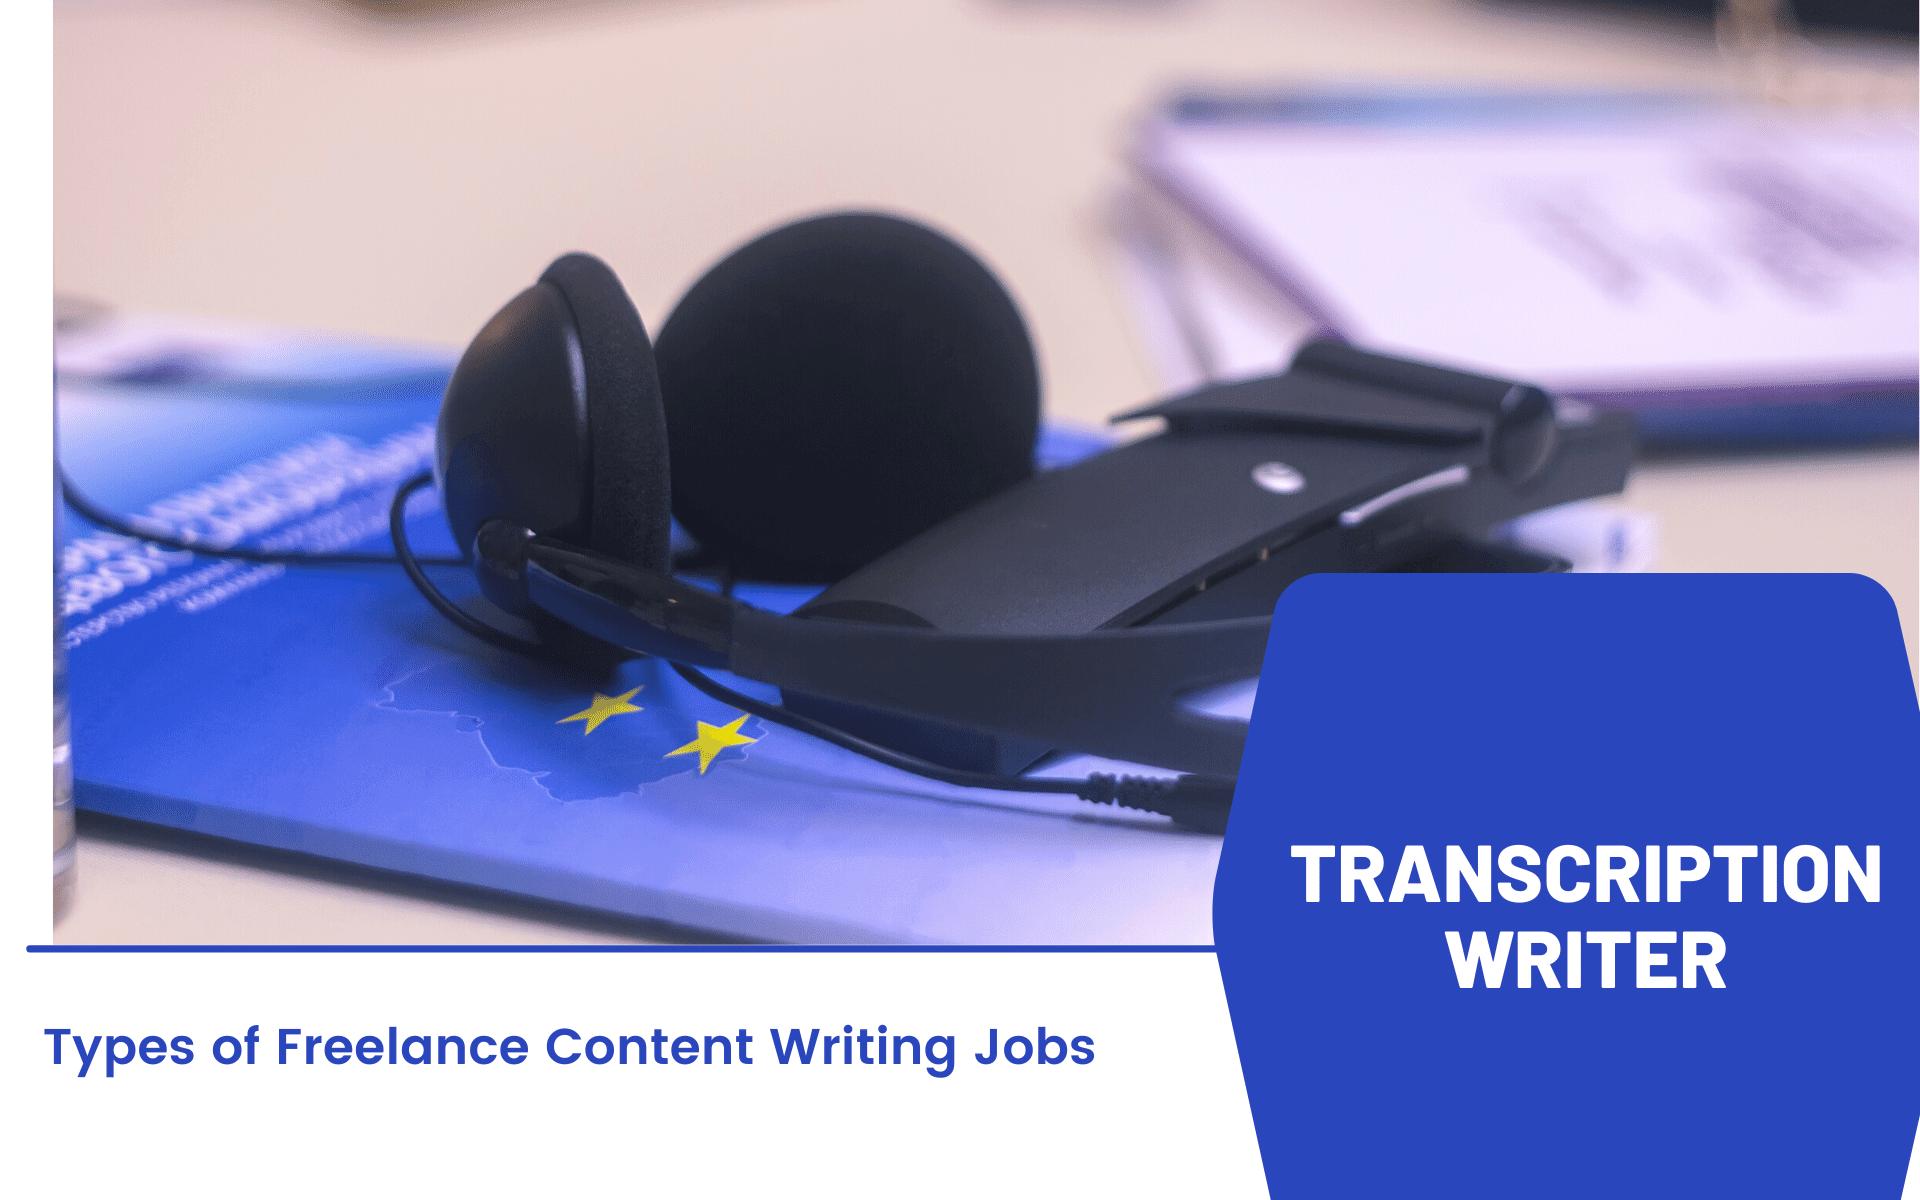 Transcription Writer